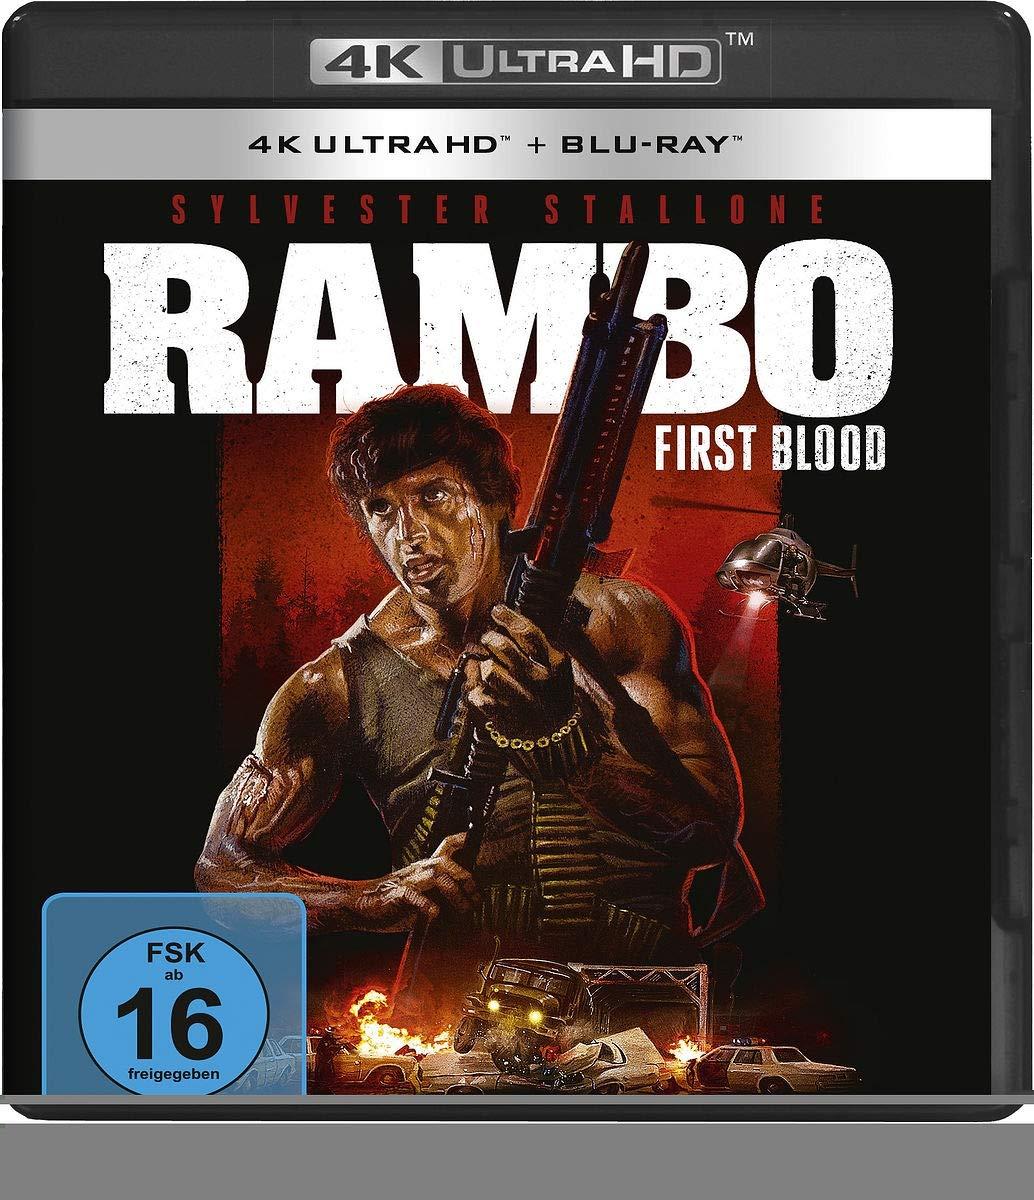 Rambo - First Blood (4K Ultra HD) [Italia] [Blu-ray]: Amazon.es: Stallone, Sylvester, Crenna, Richard, Dennehy, Brian, Caruso, David, Starrett, Jack, Kotcheff, Ted, Stallone, Sylvester, Crenna, Richard: Cine y Series TV